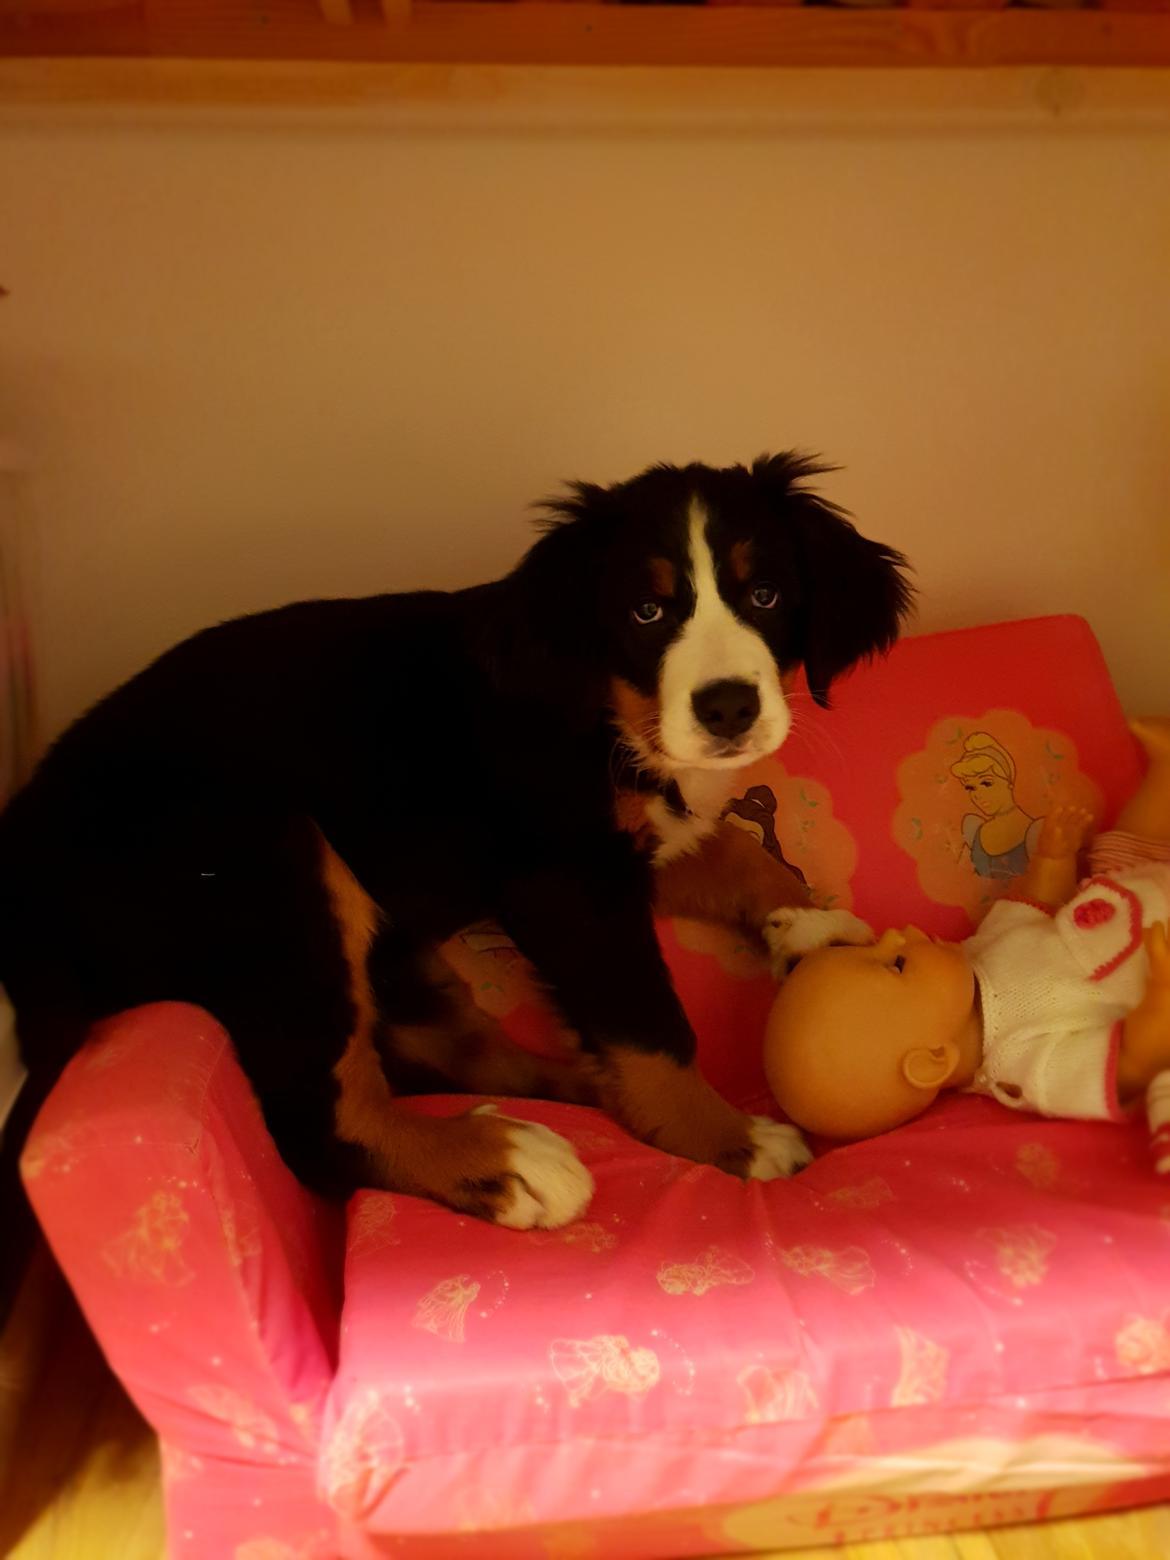 Berner sennenhund Toffie billede 23